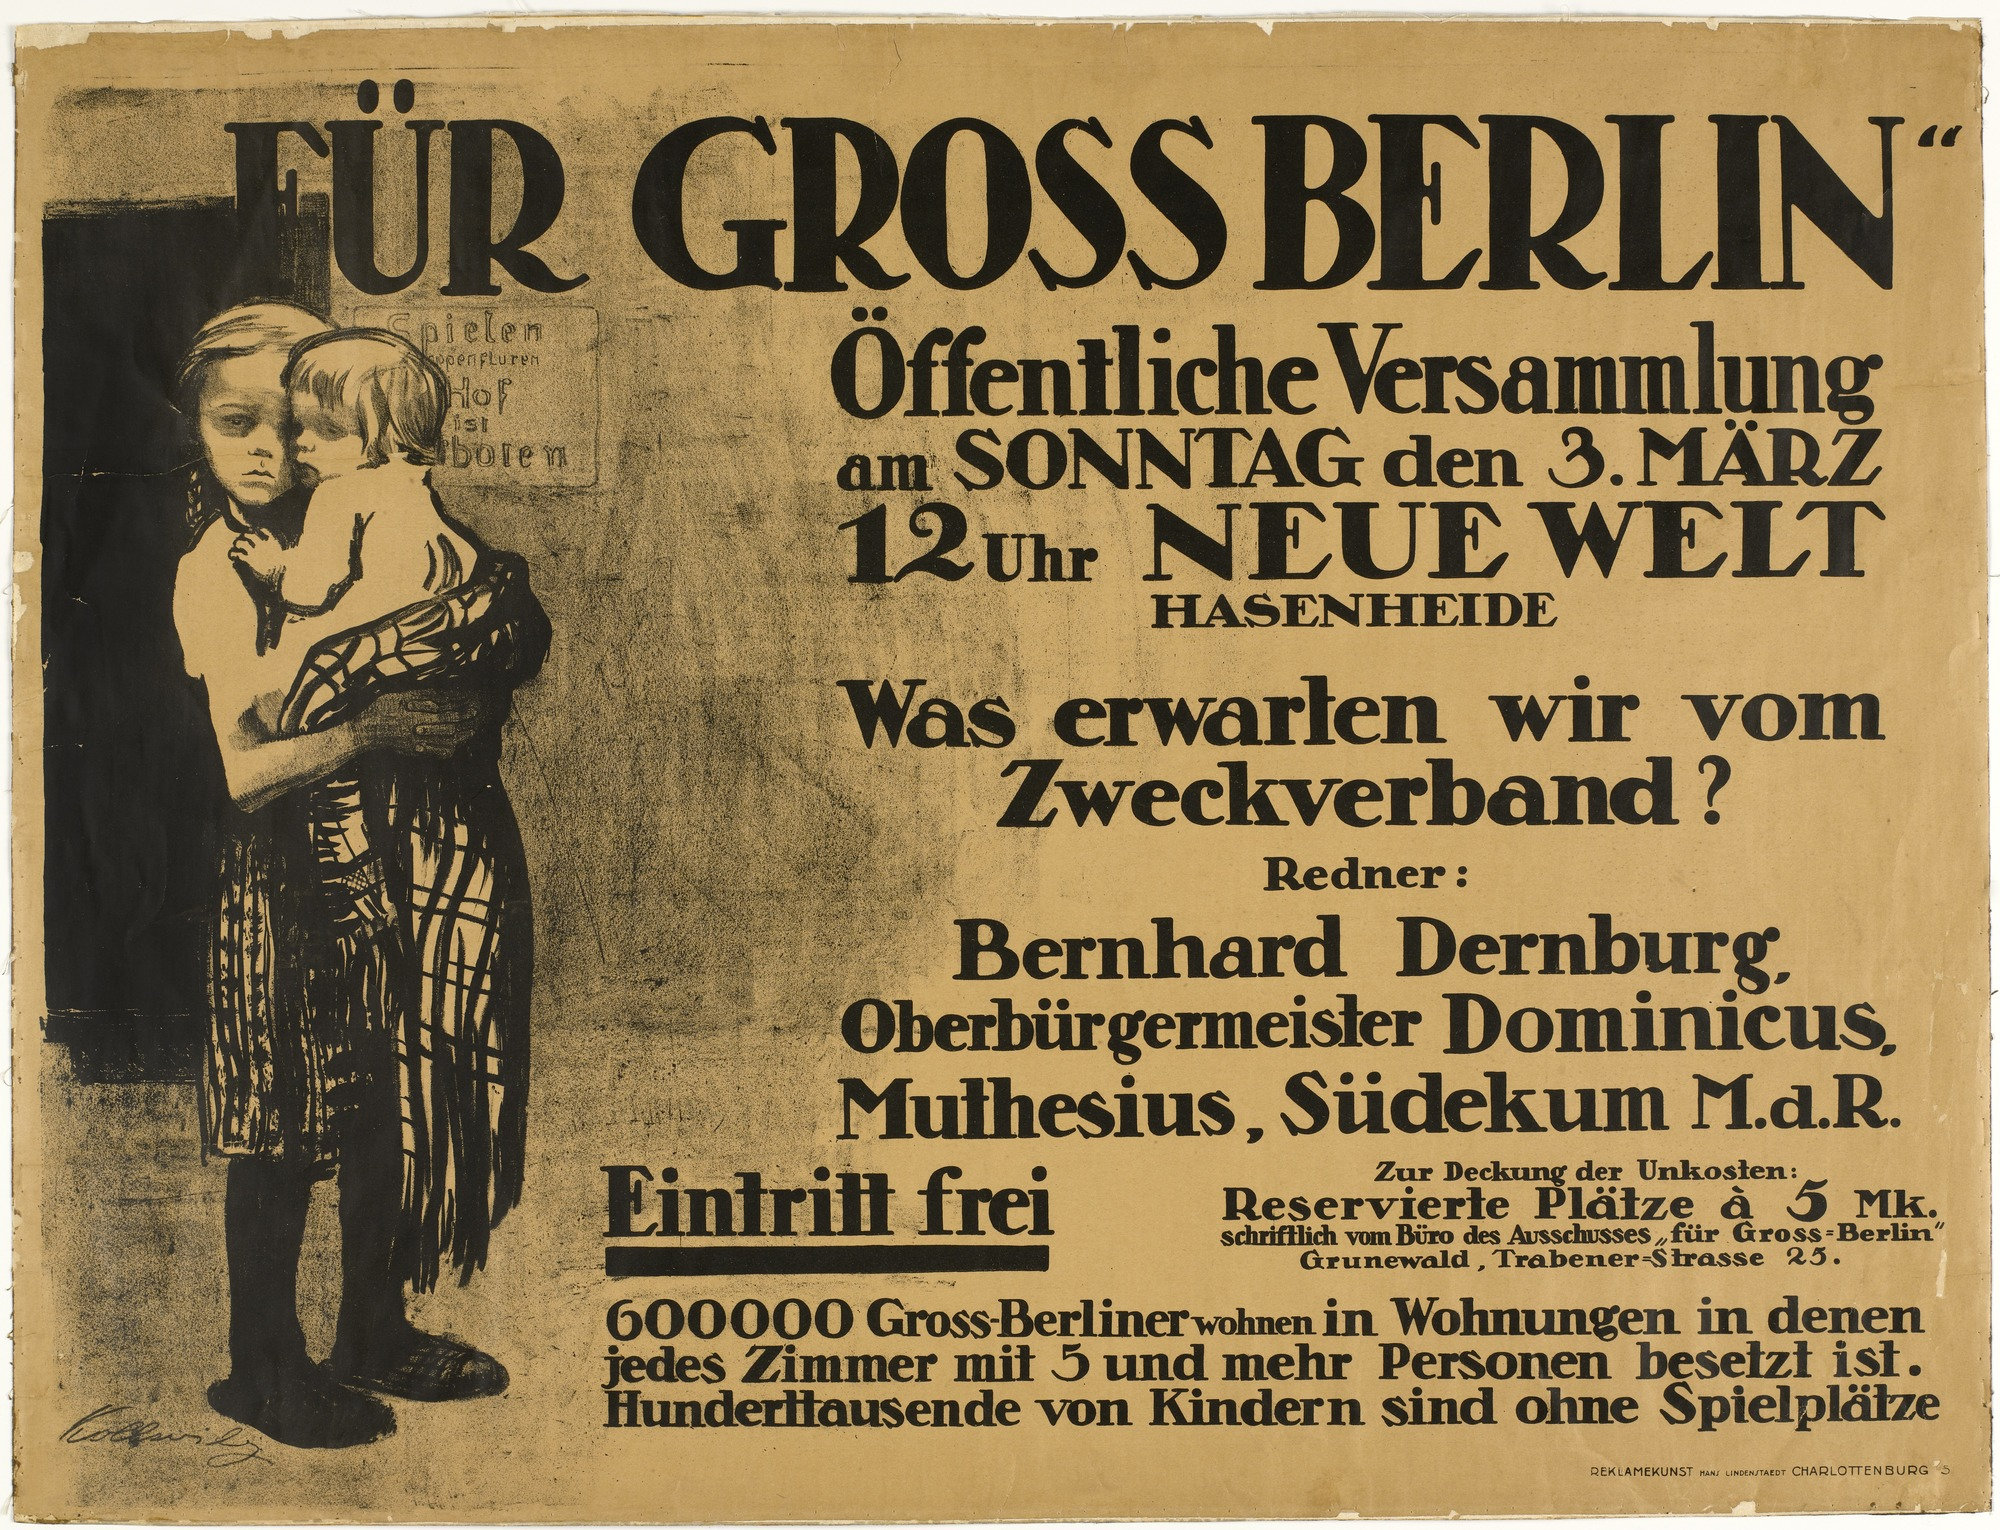 Gross Berlin moma the collection käthe kollwitz for greater berlin für